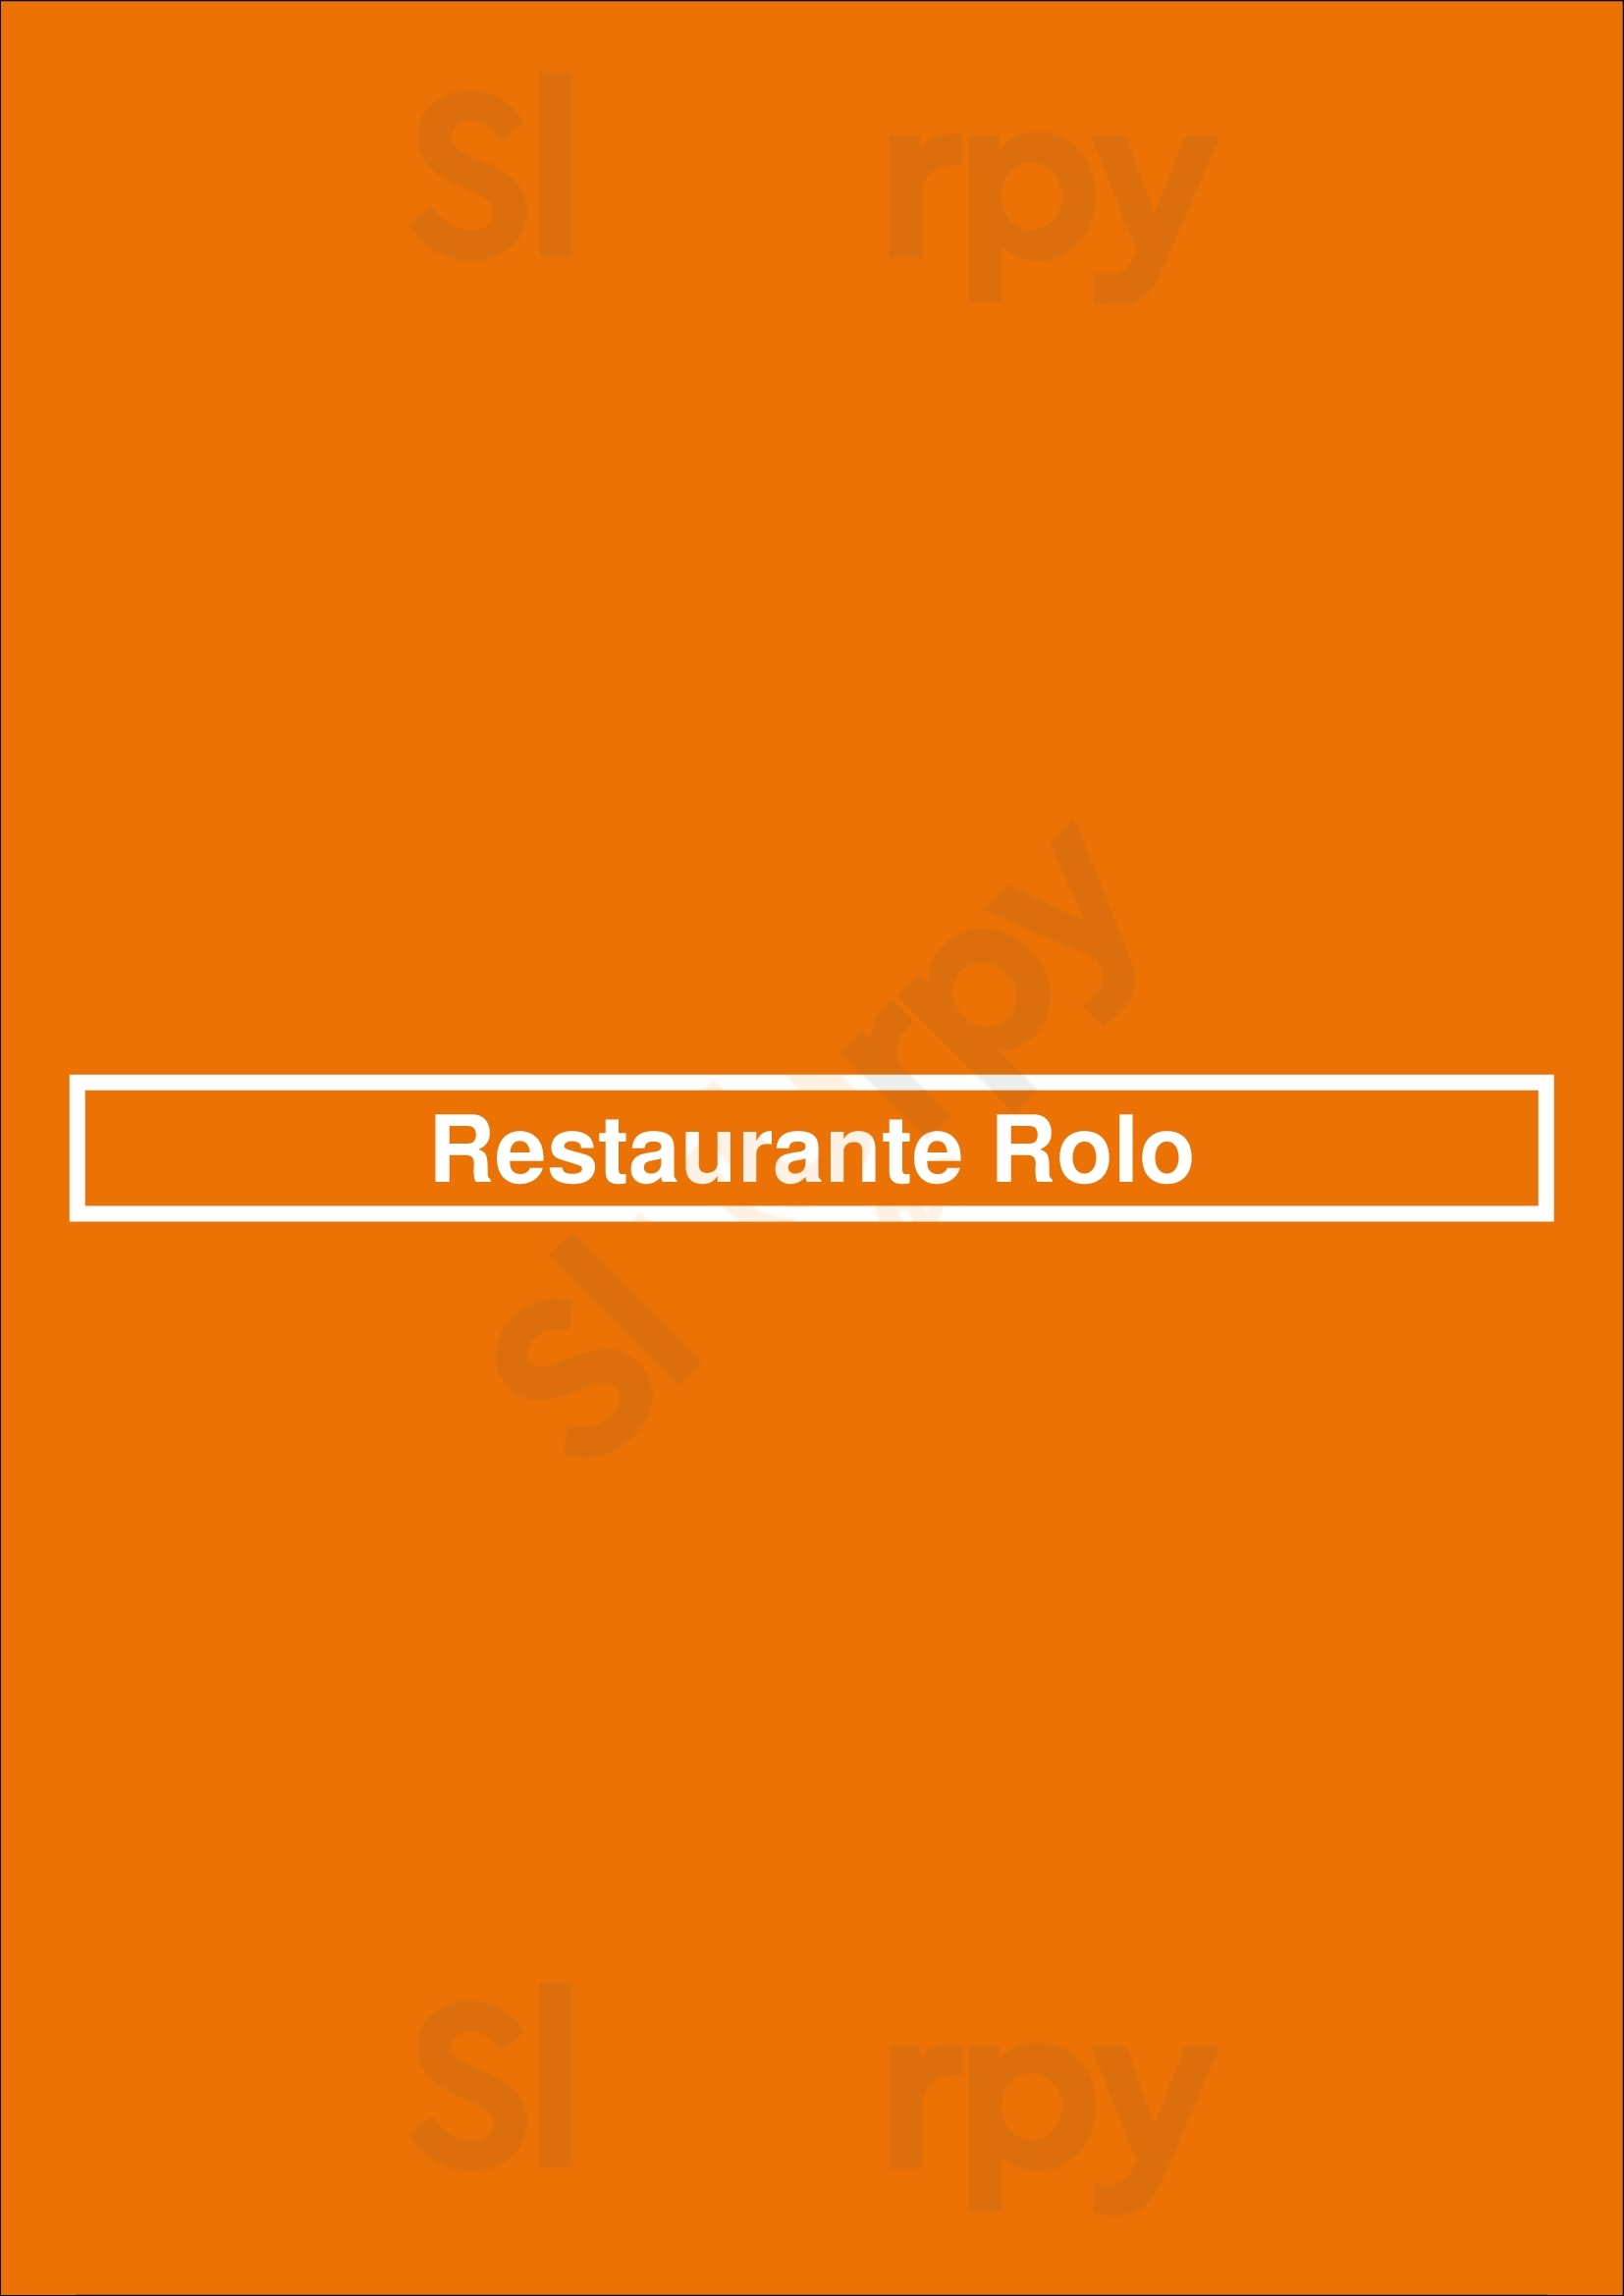 Restaurante Rolo Lisboa Menu - 1